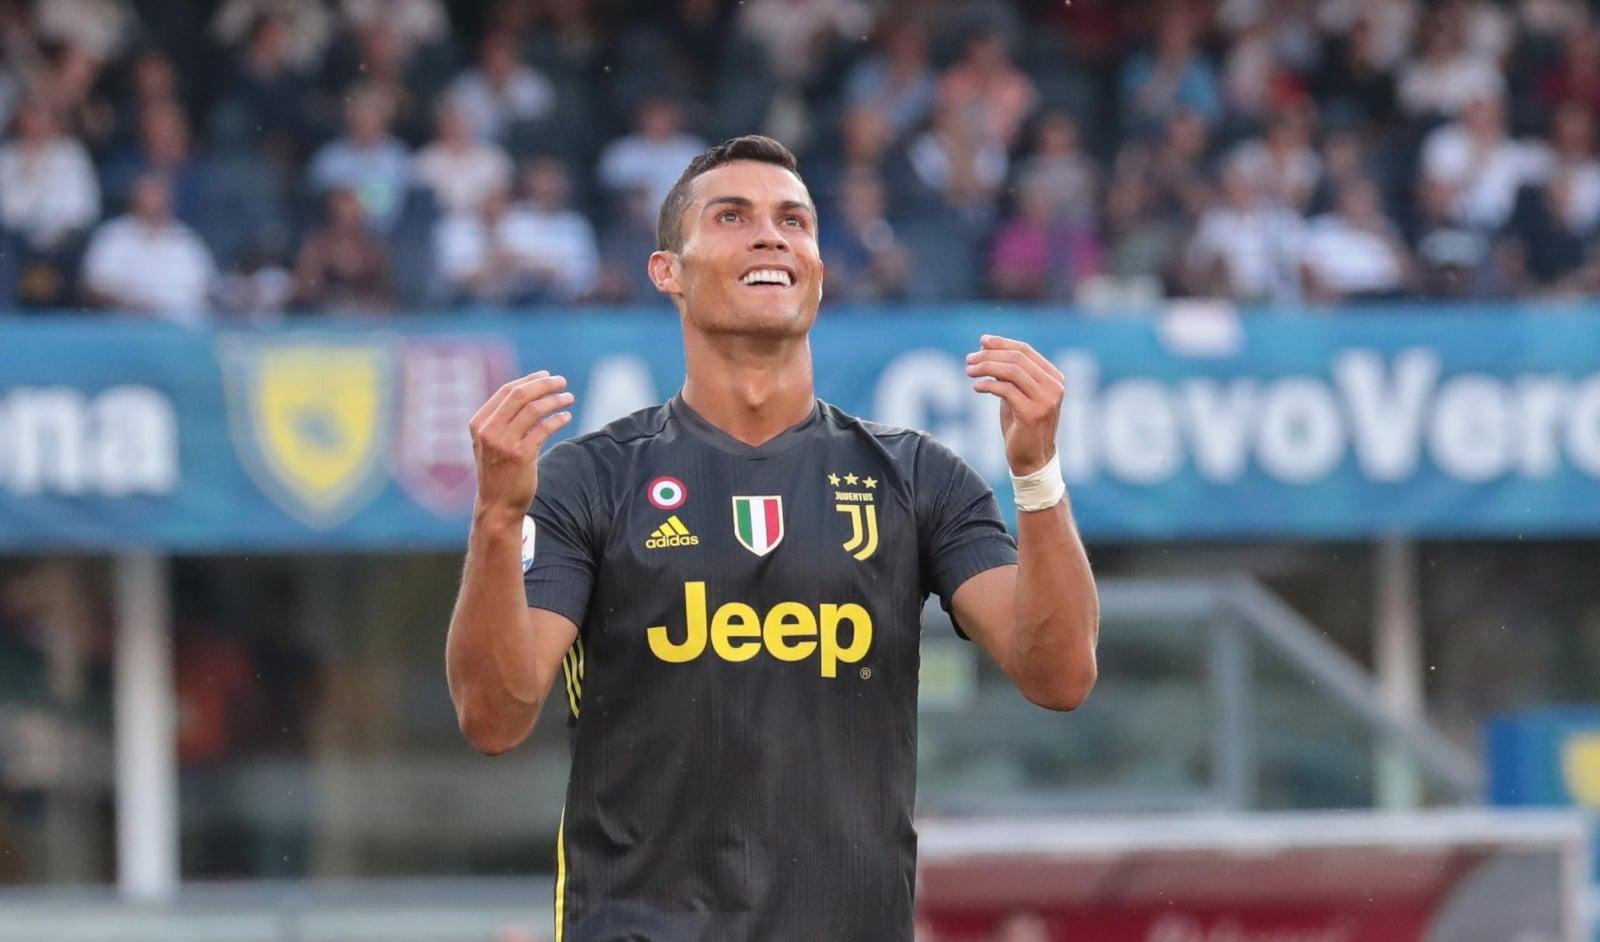 Cristiano Ronaldo pierwszy raz w barwach Juventusu Turyn. Fot. PAP/EPA/FILIPPO VENEZIA